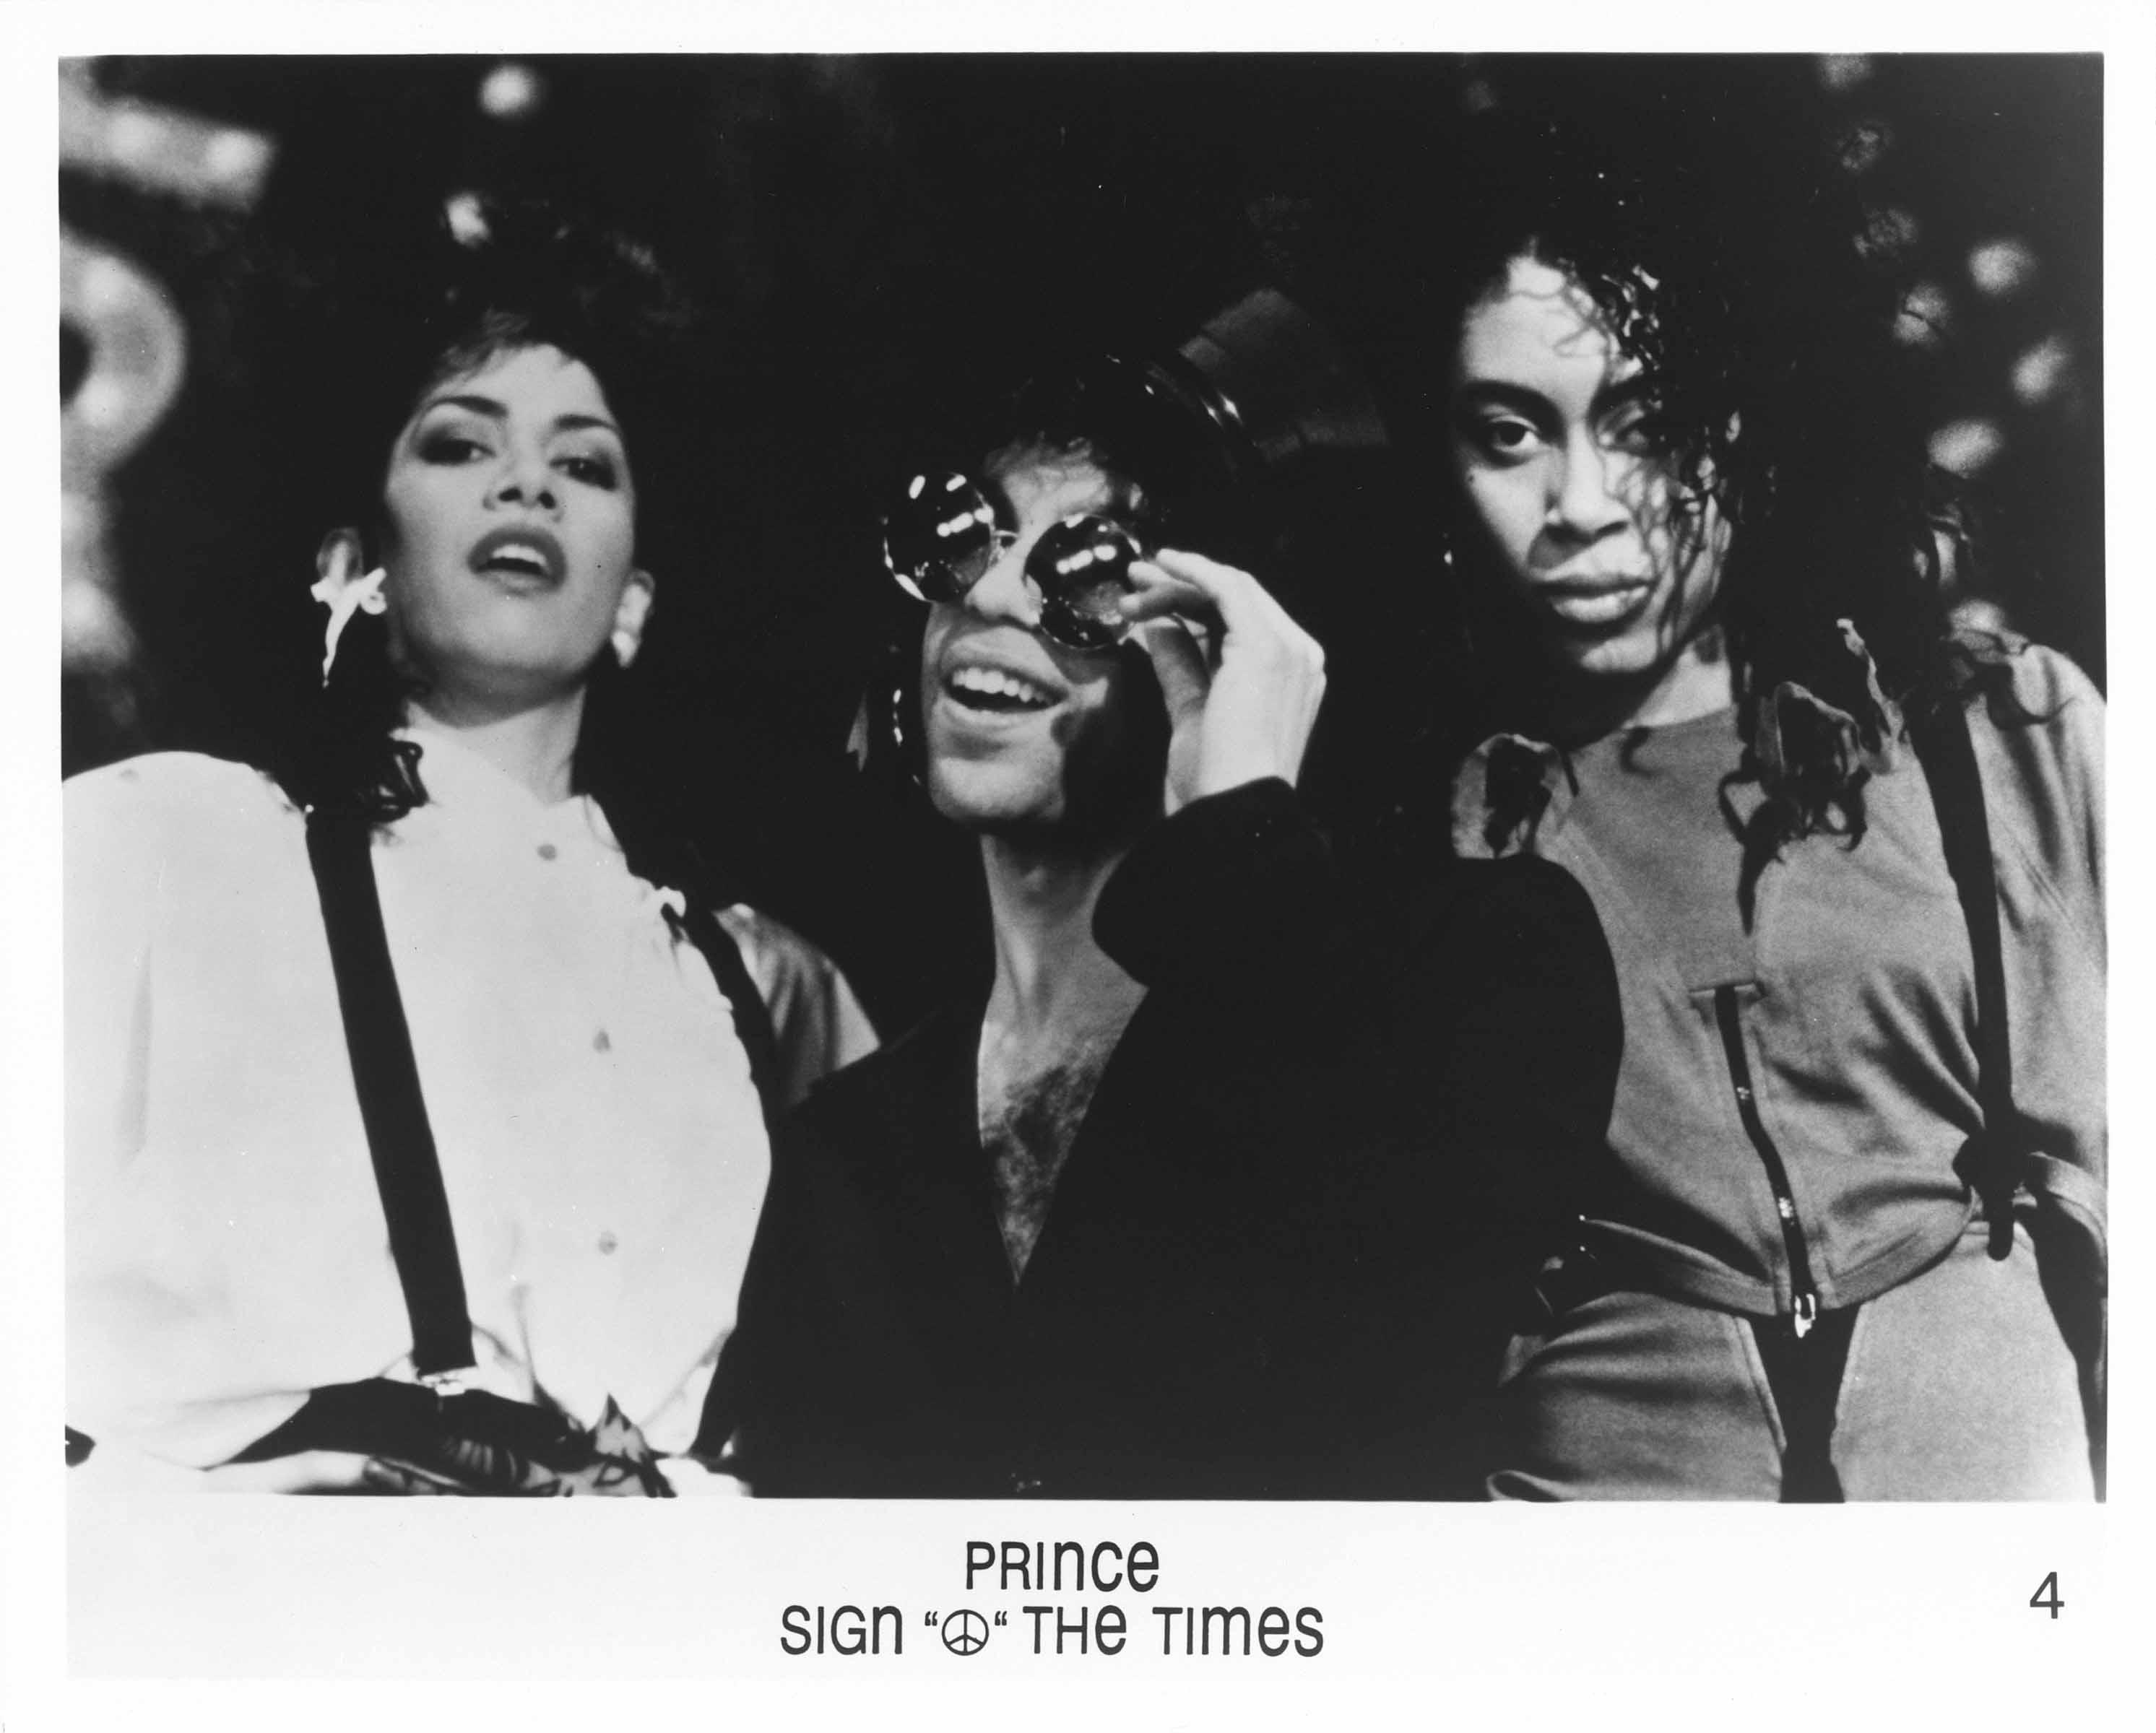 prince_signs_o_the_times_1